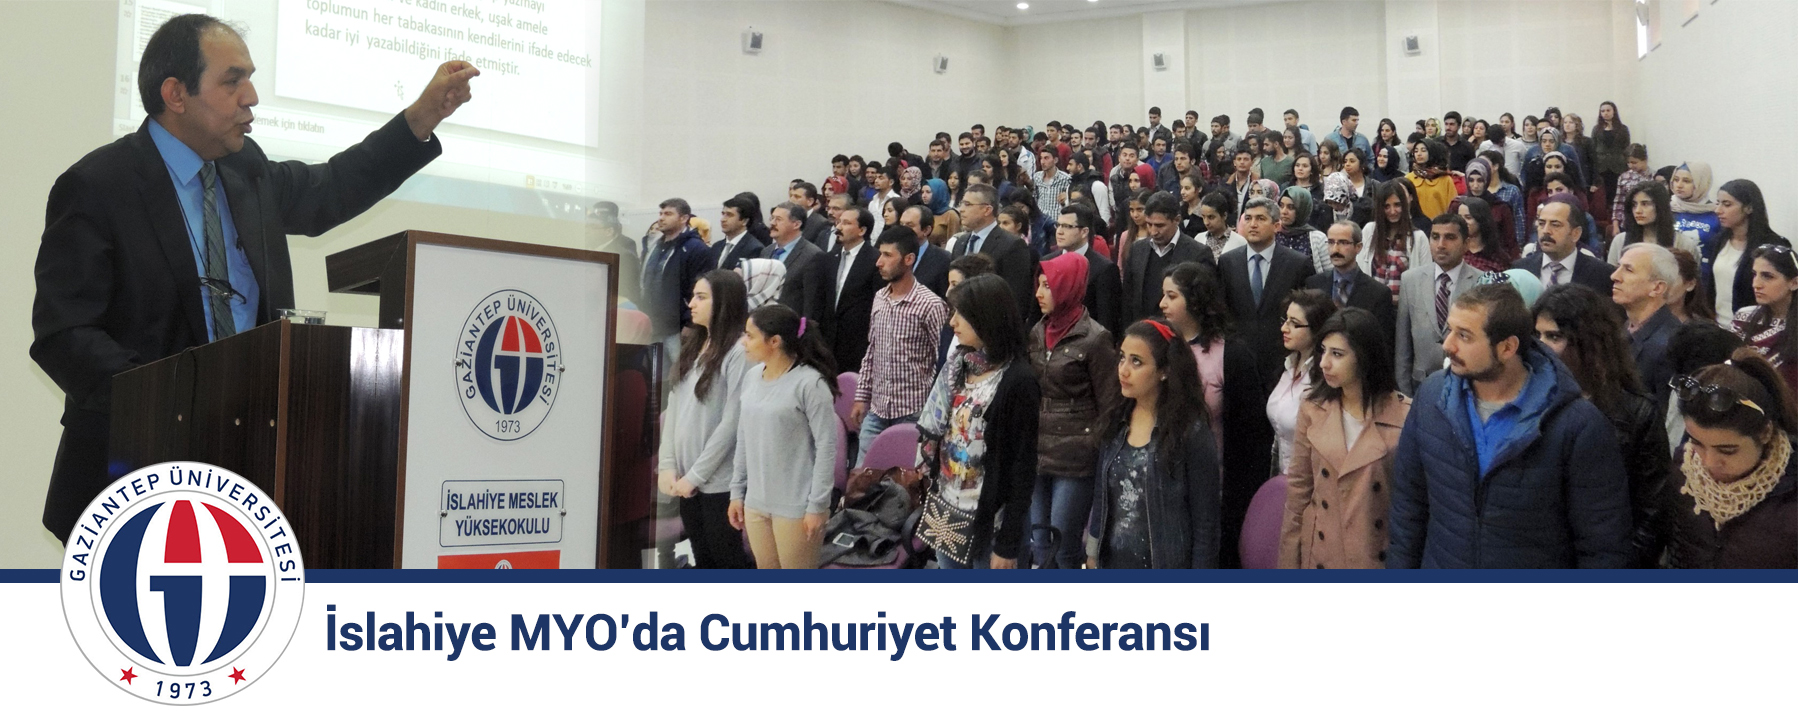 İslahiye MYO'da Cumhuriyet Konferansı